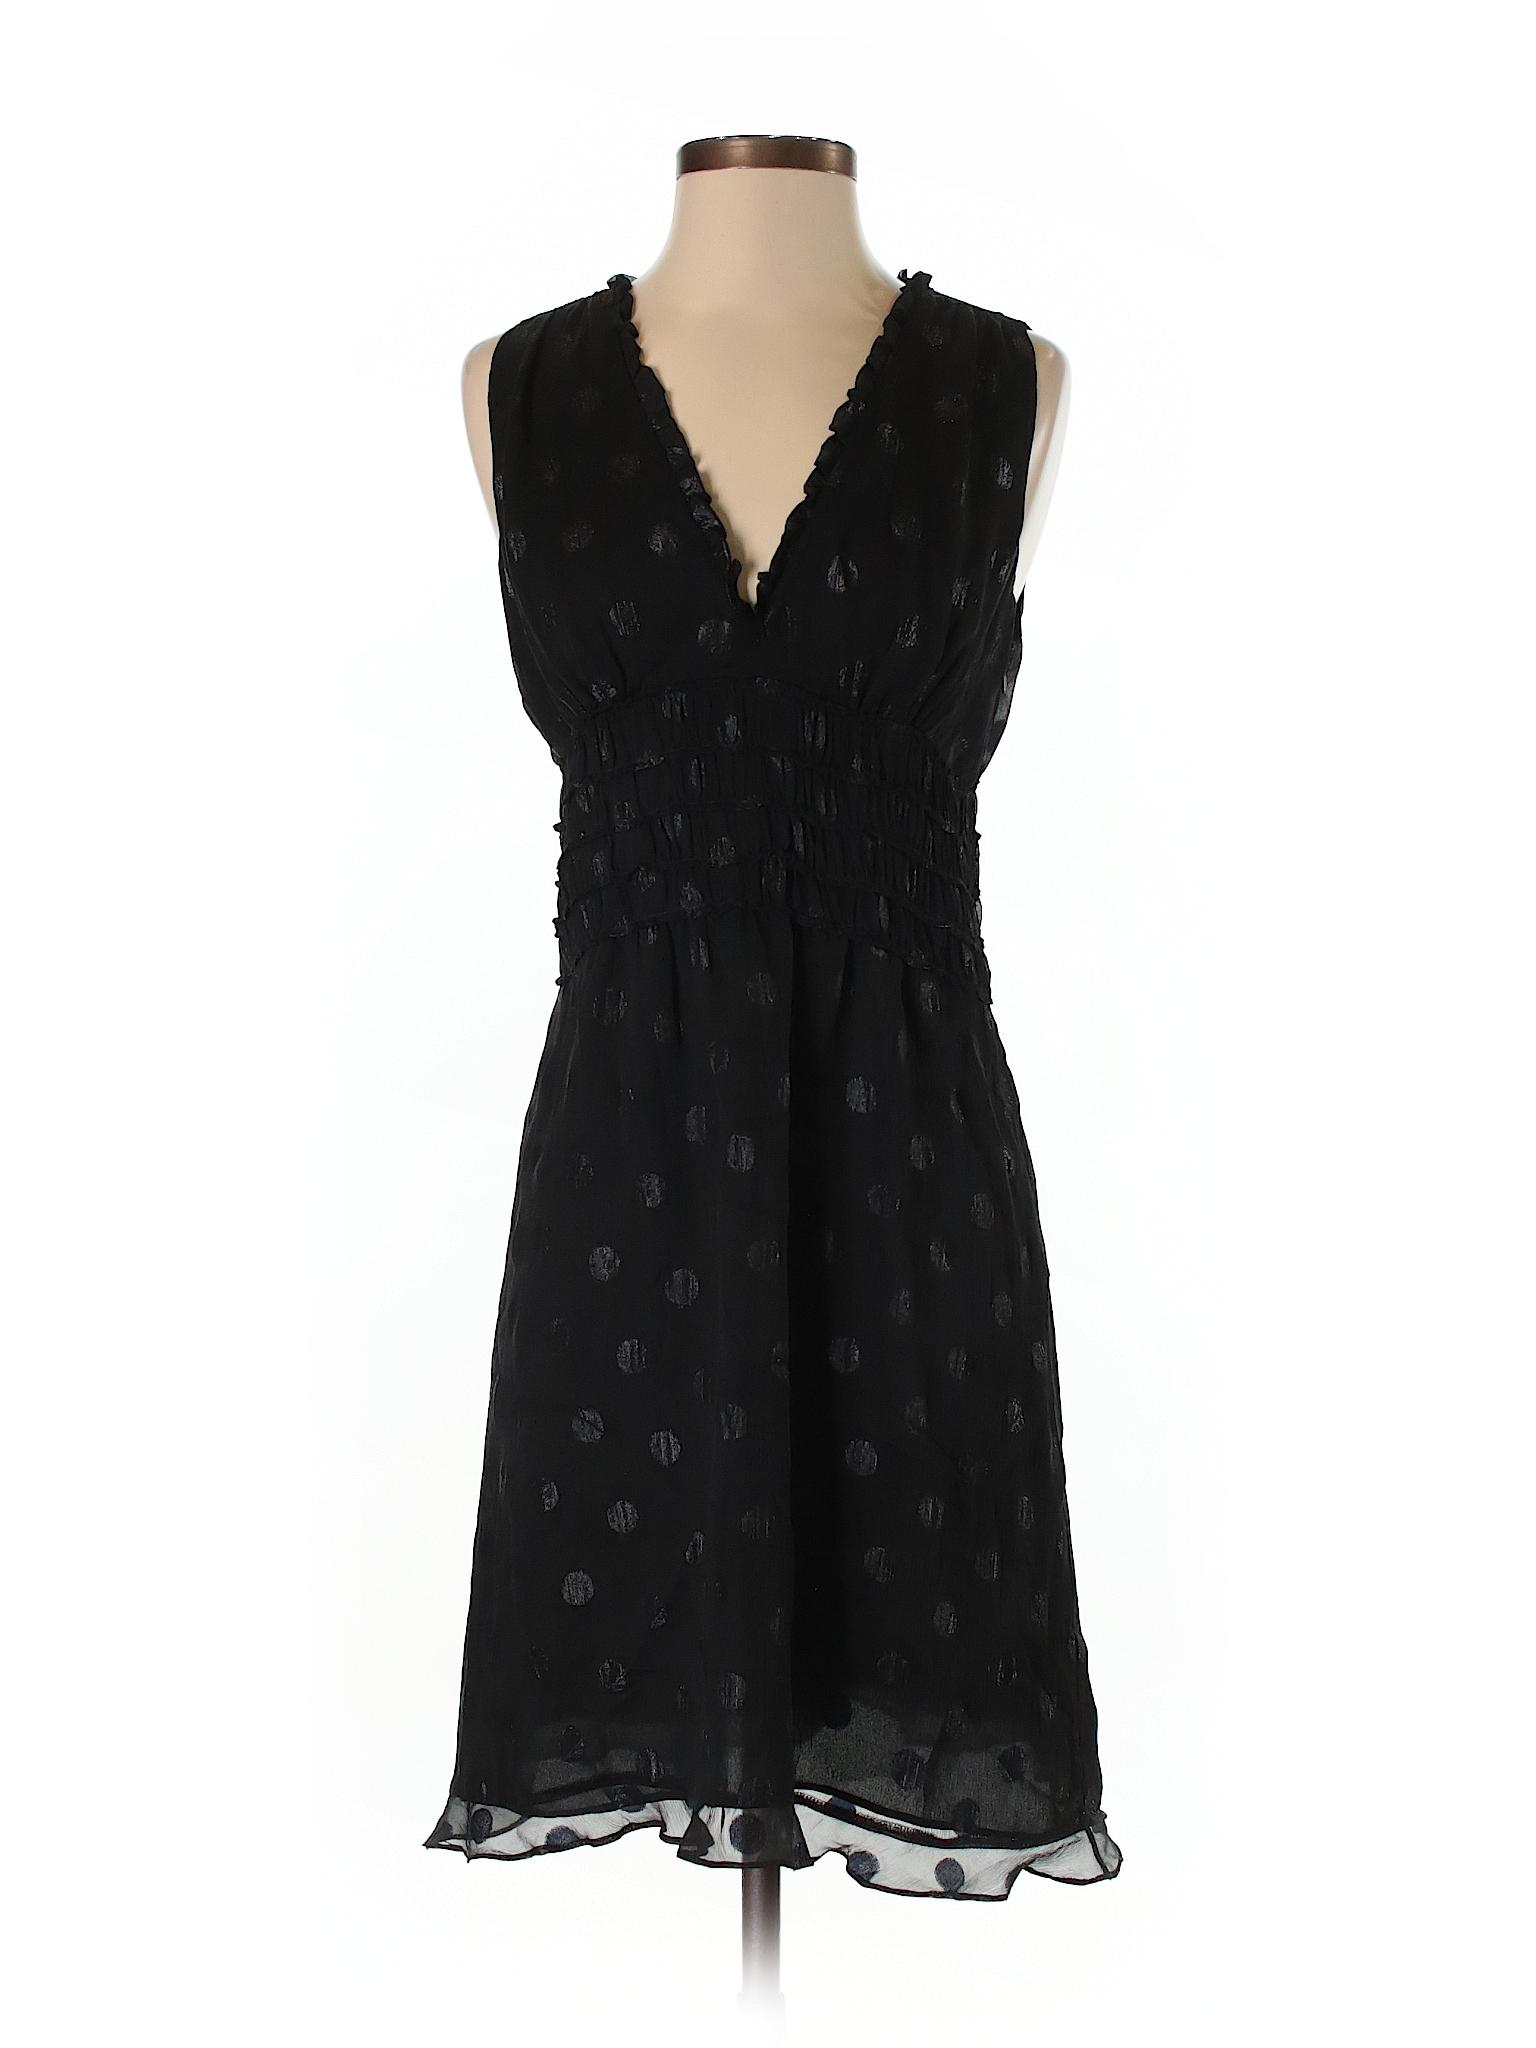 Dress Derek winter Lam Casual Boutique IYv57xI